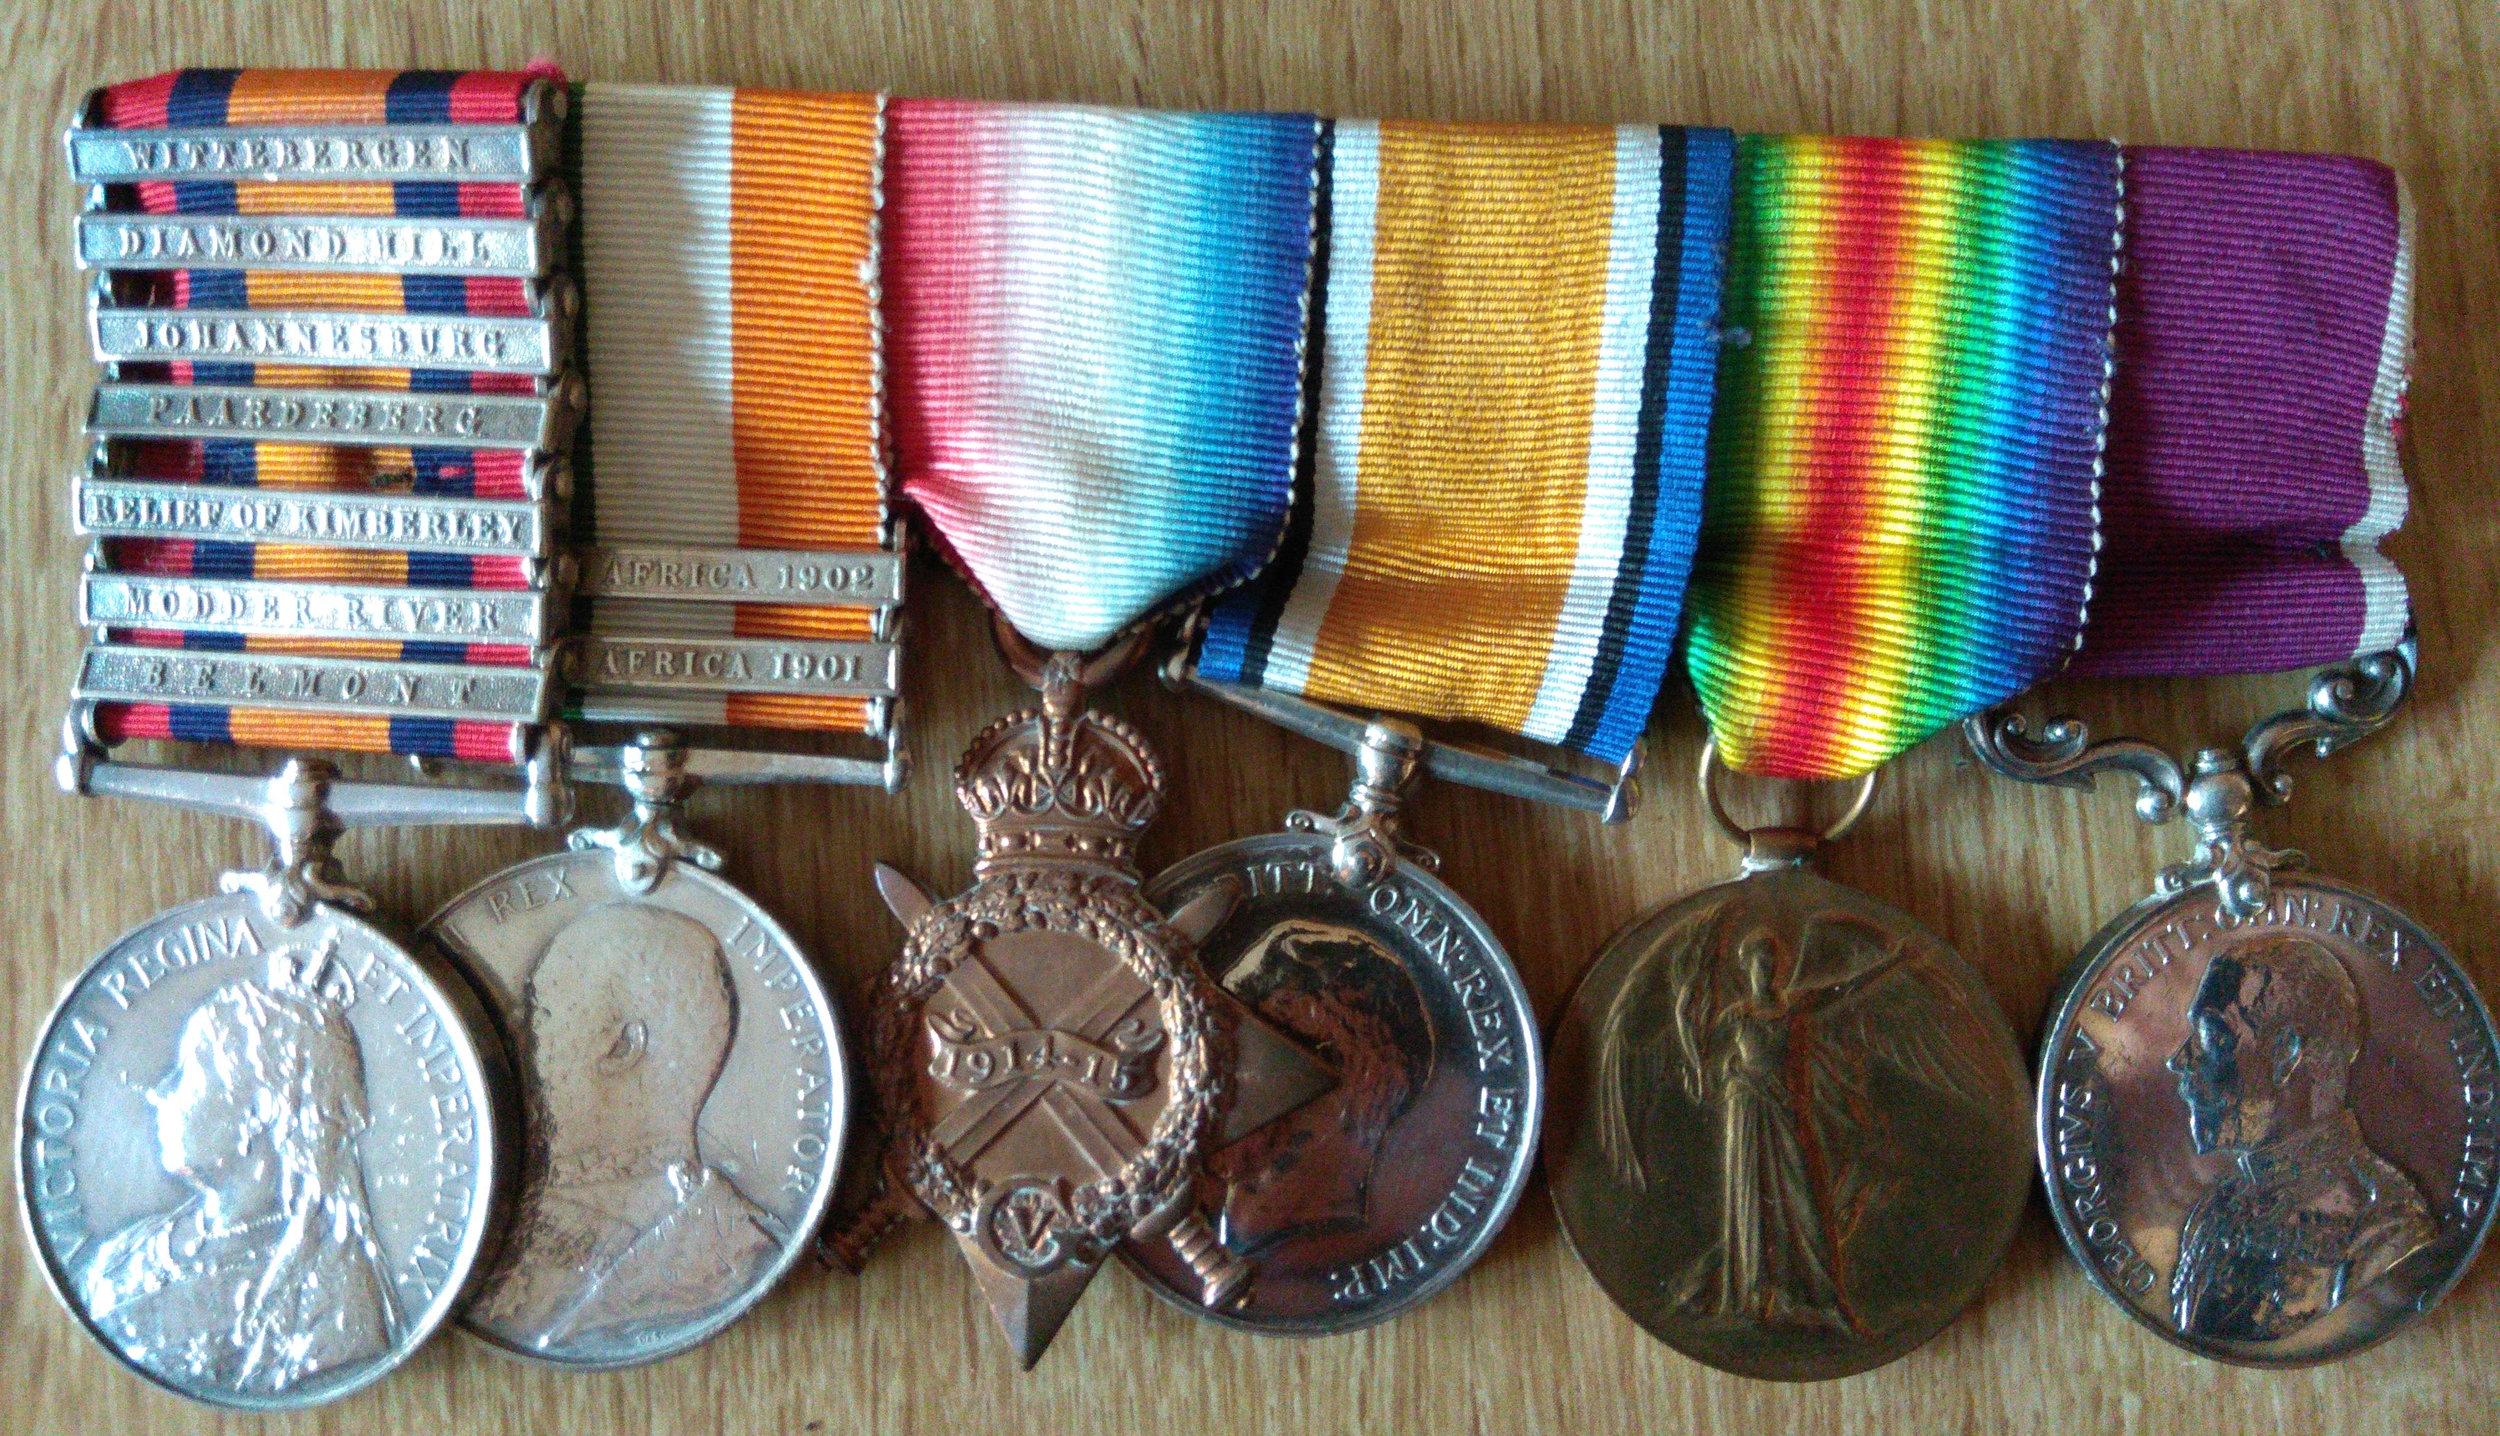 Walter's full set of medals